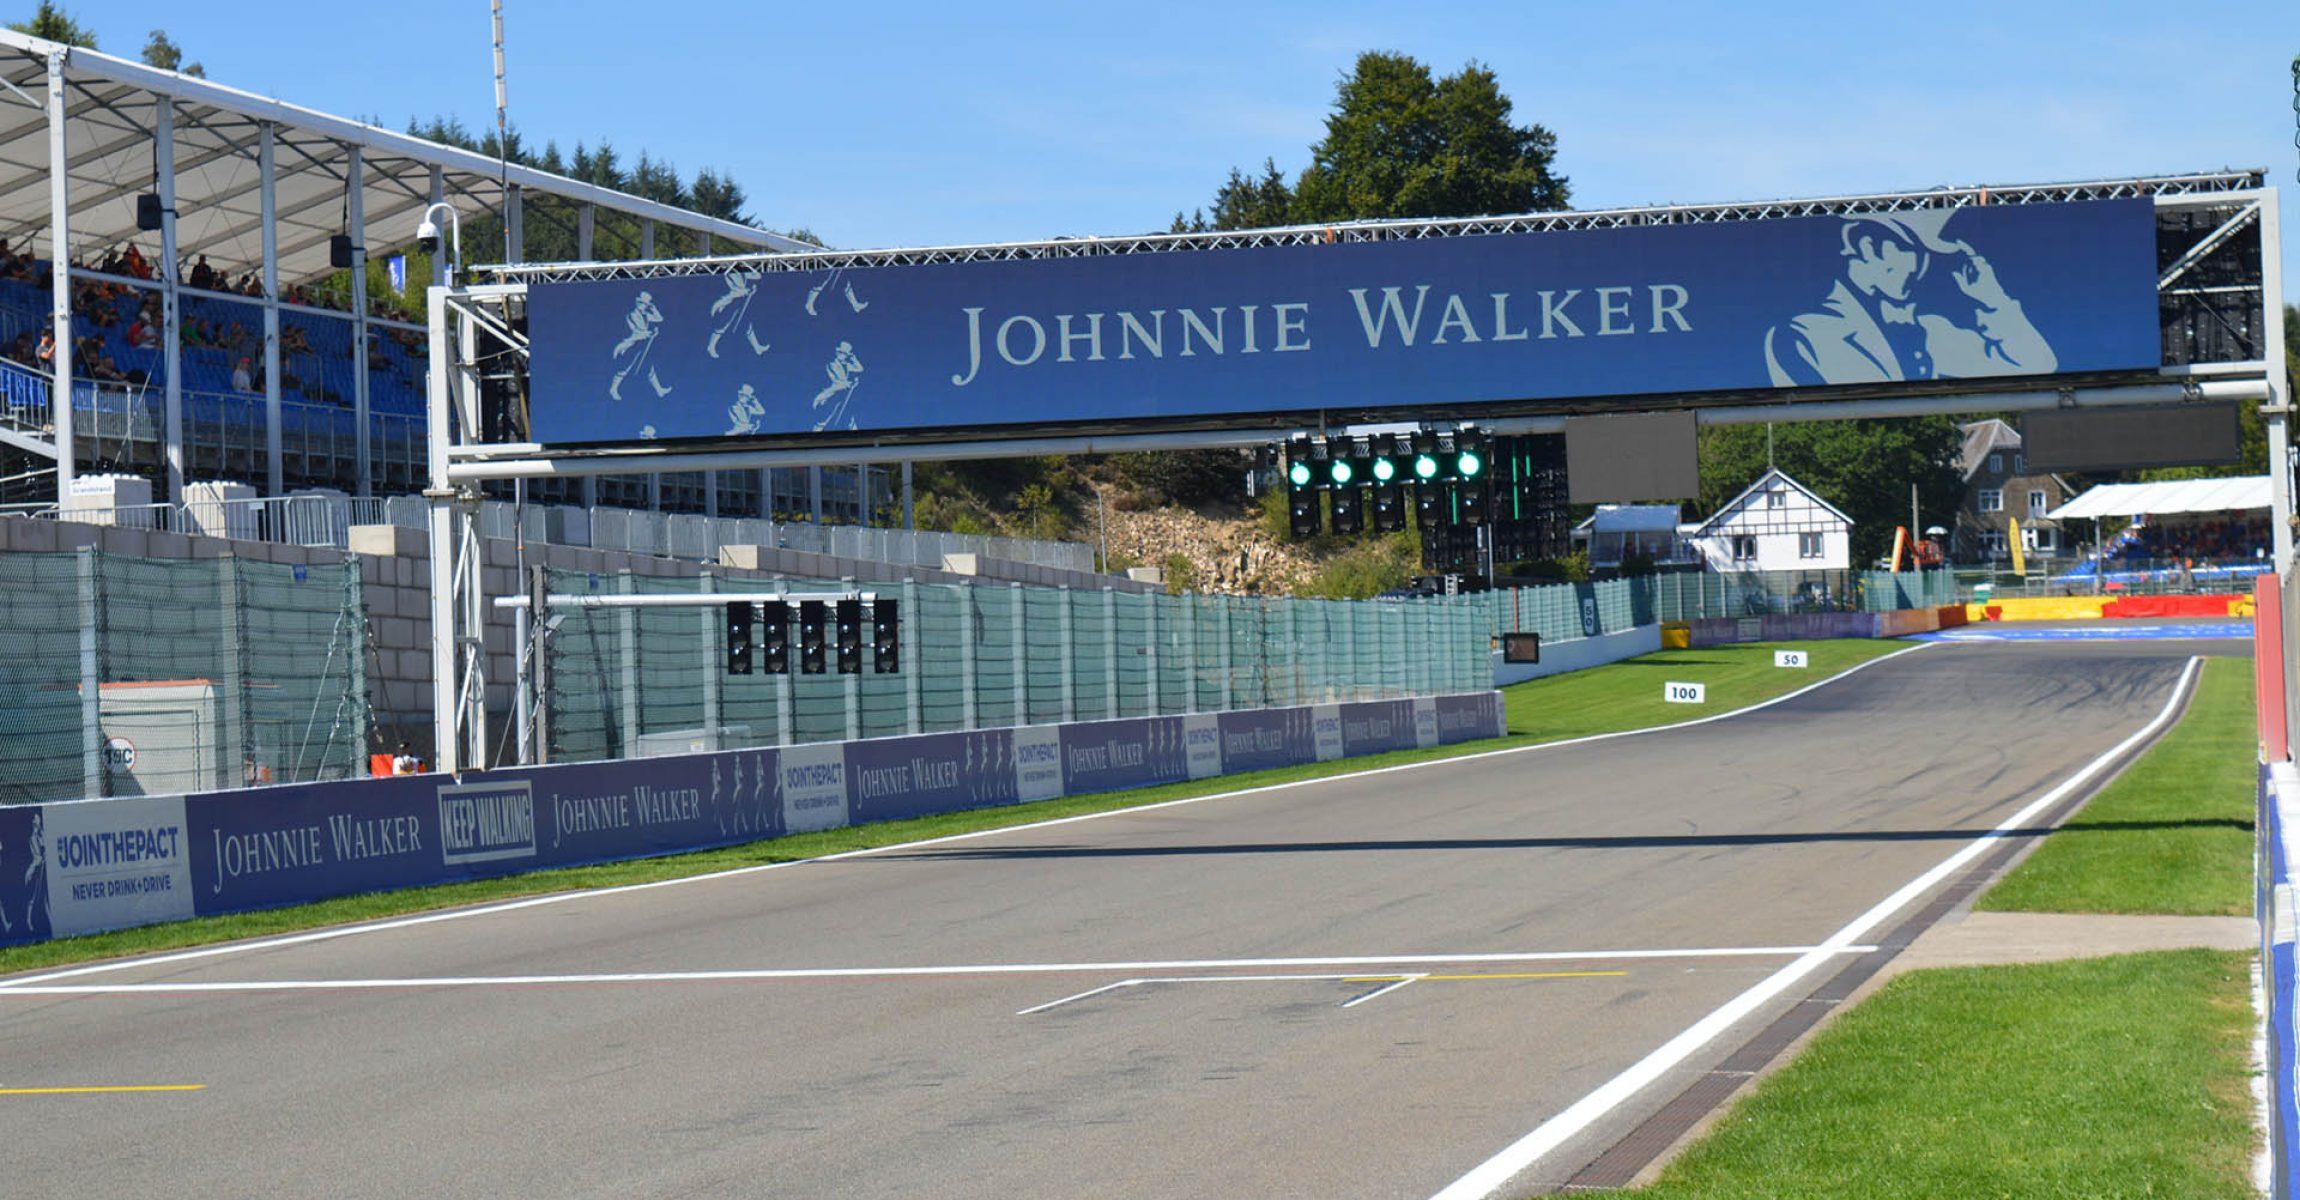 Spa-Francorchamps Start-finish line, Johnnie Walker, Belgian Grand Prix 2019